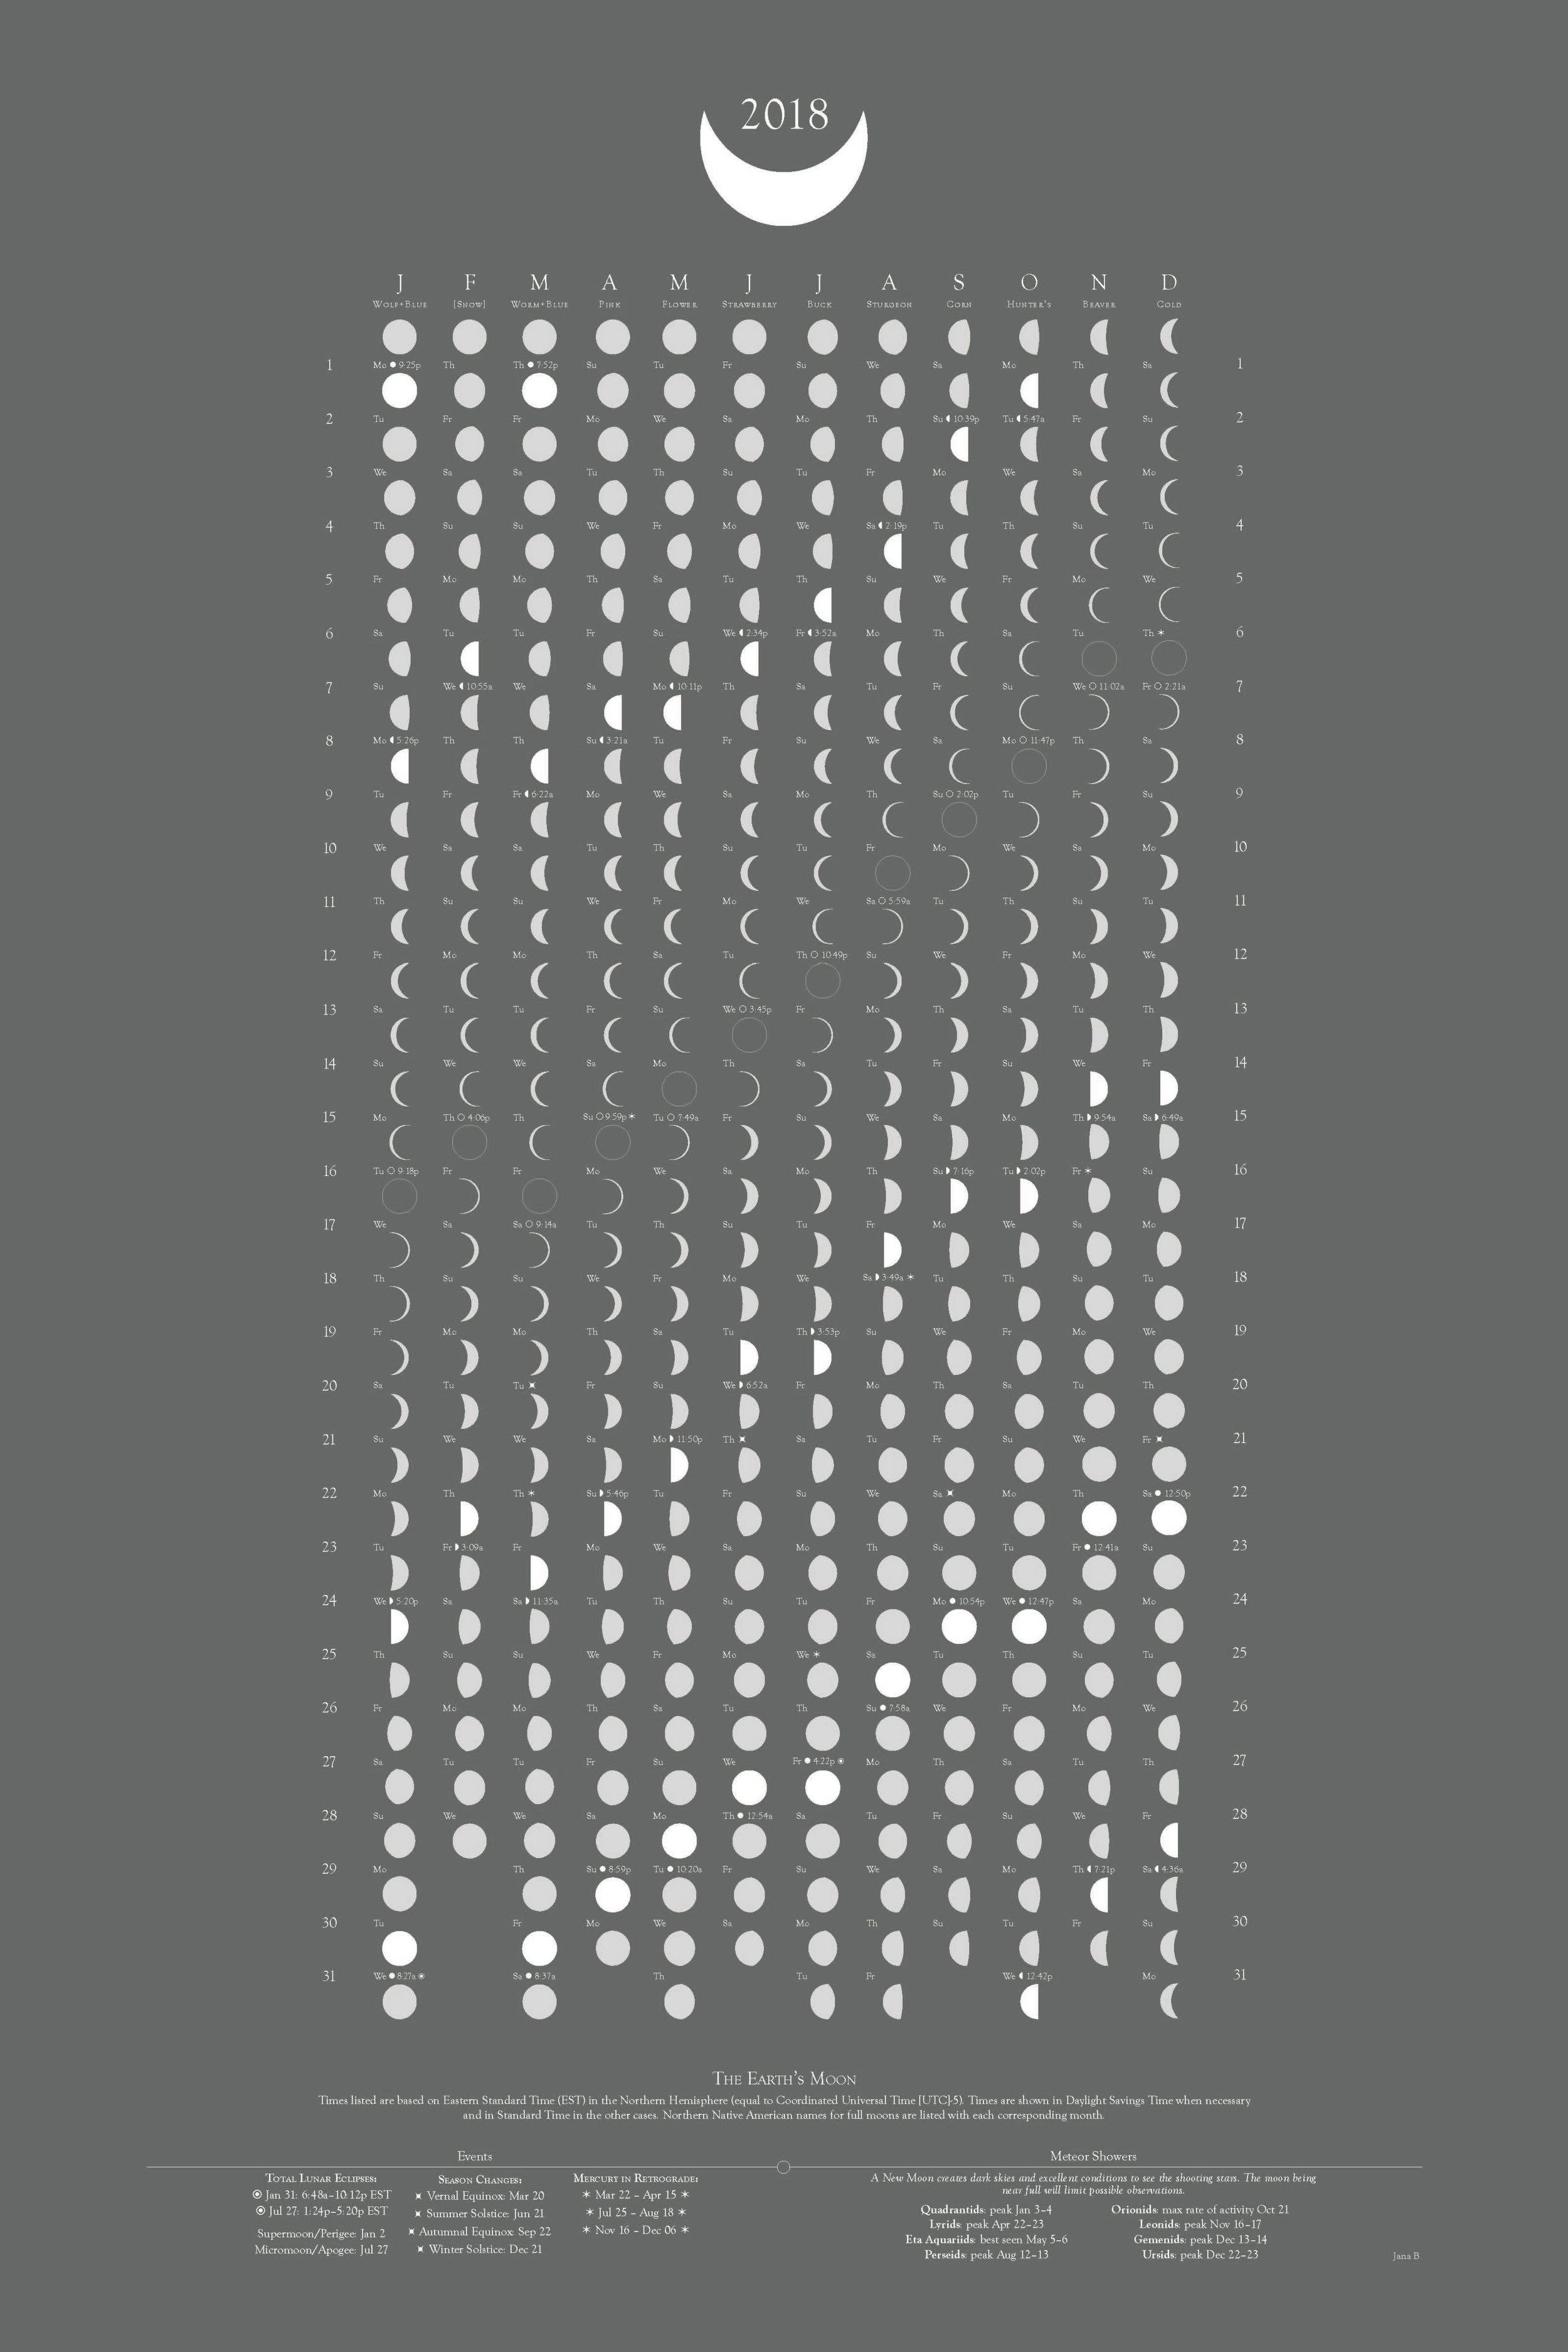 LunarCalendar-16x24.jpg